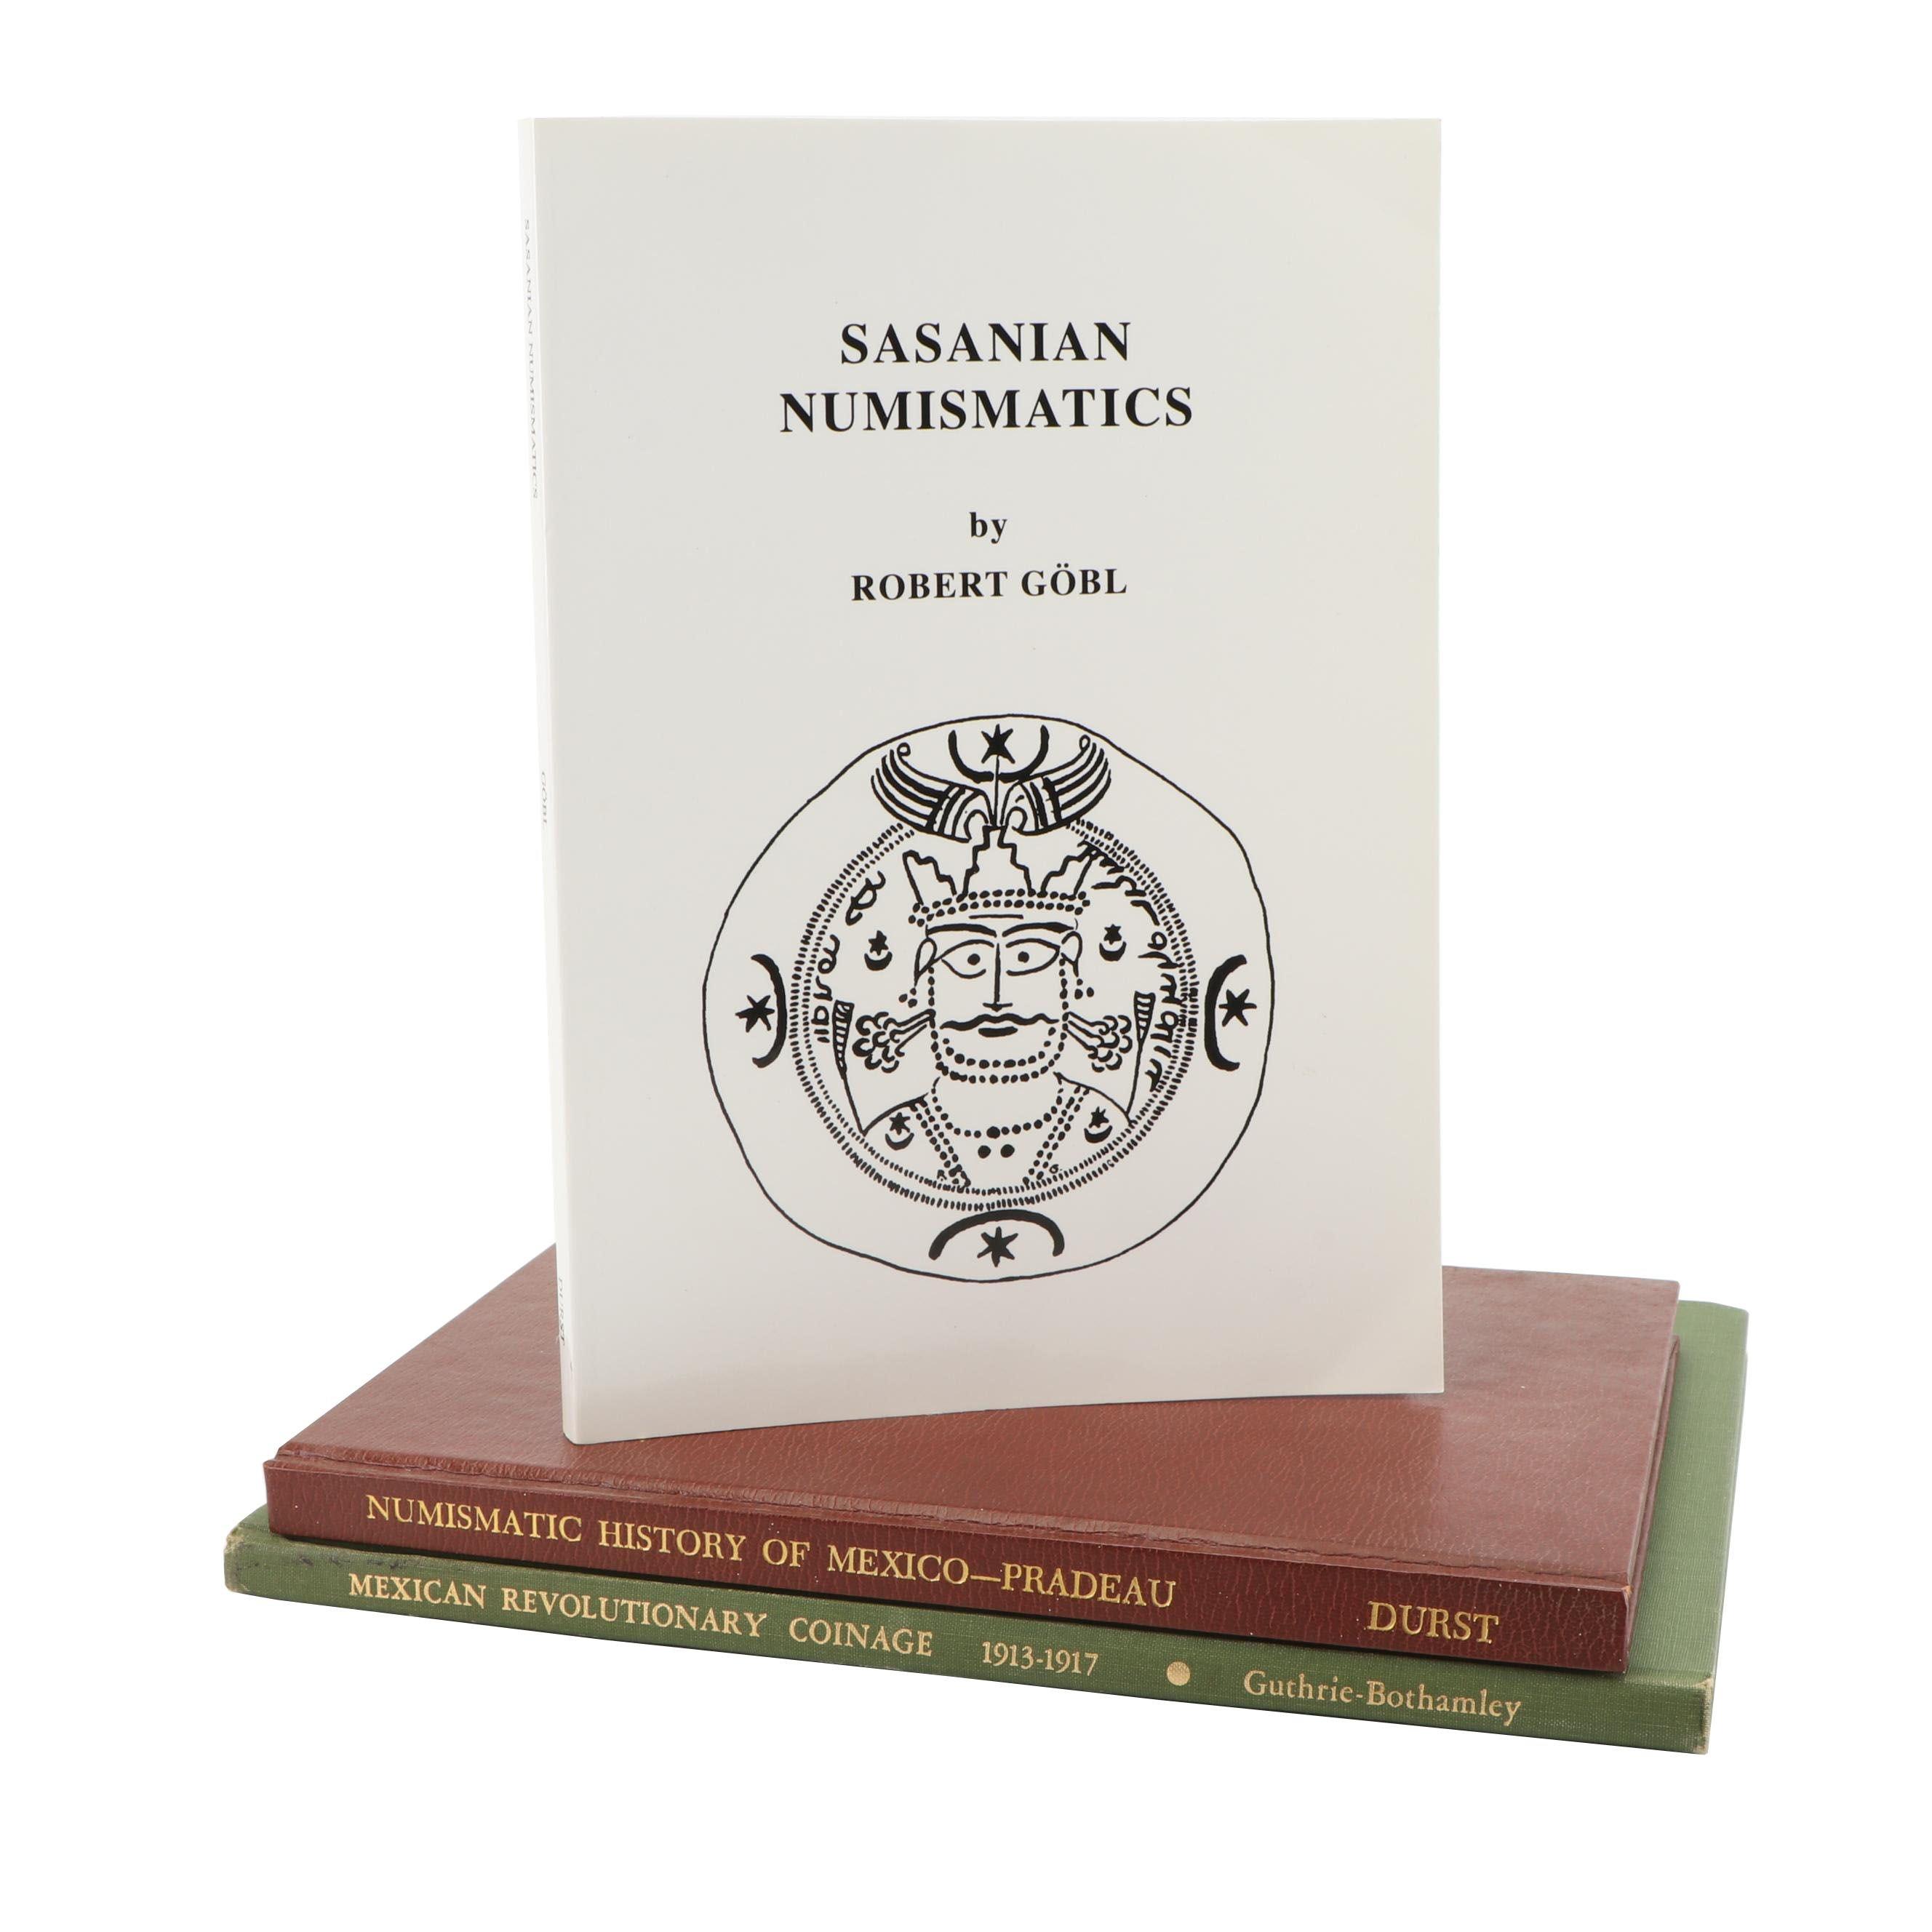 """Sasanian Numismatics"" and Books on Mexican Numismatics"